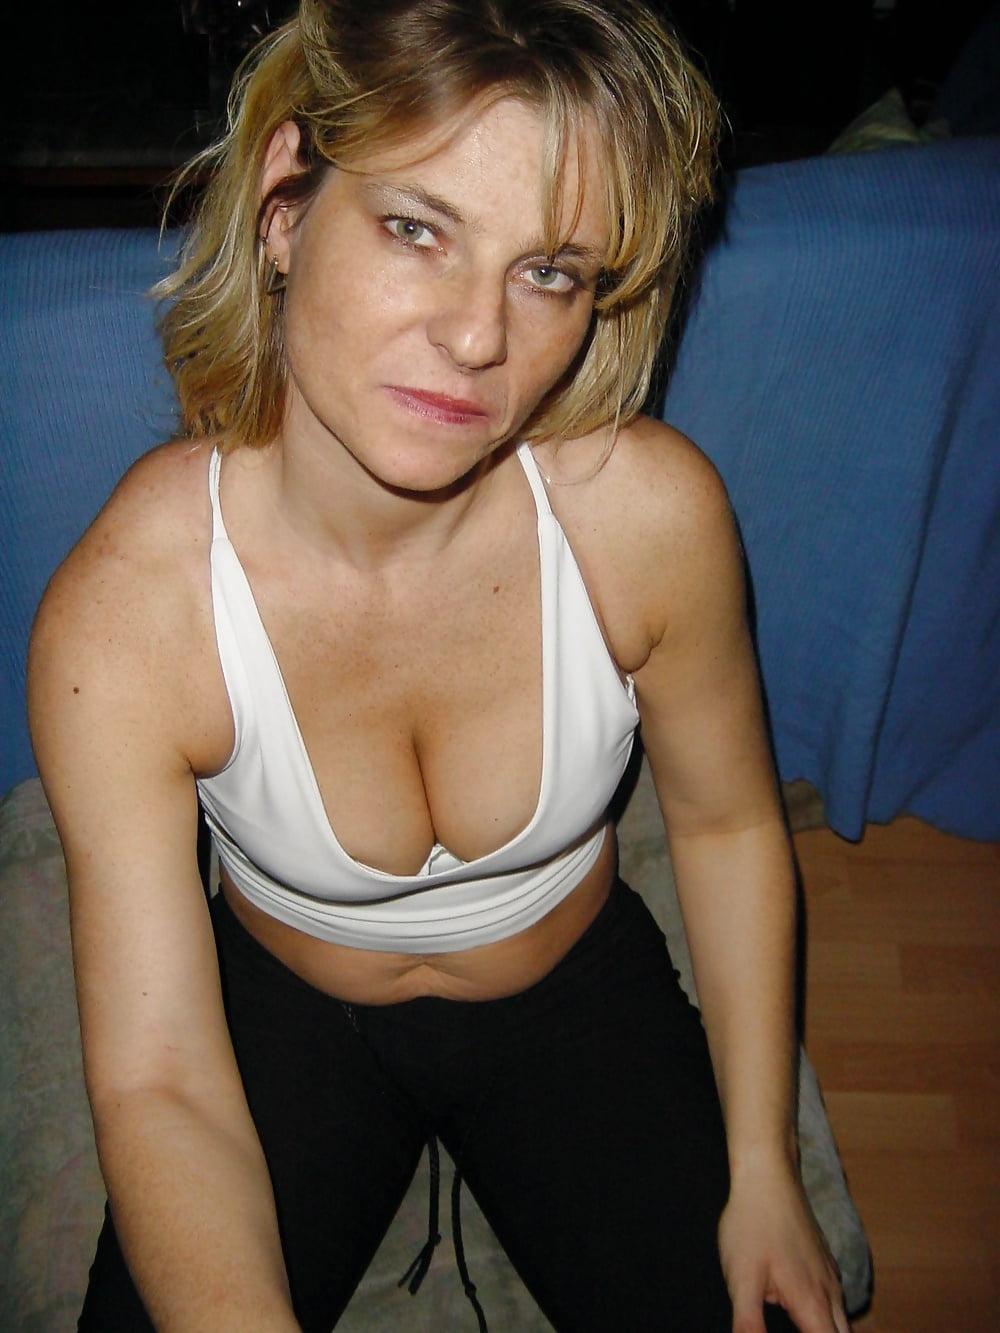 Nice cleavage